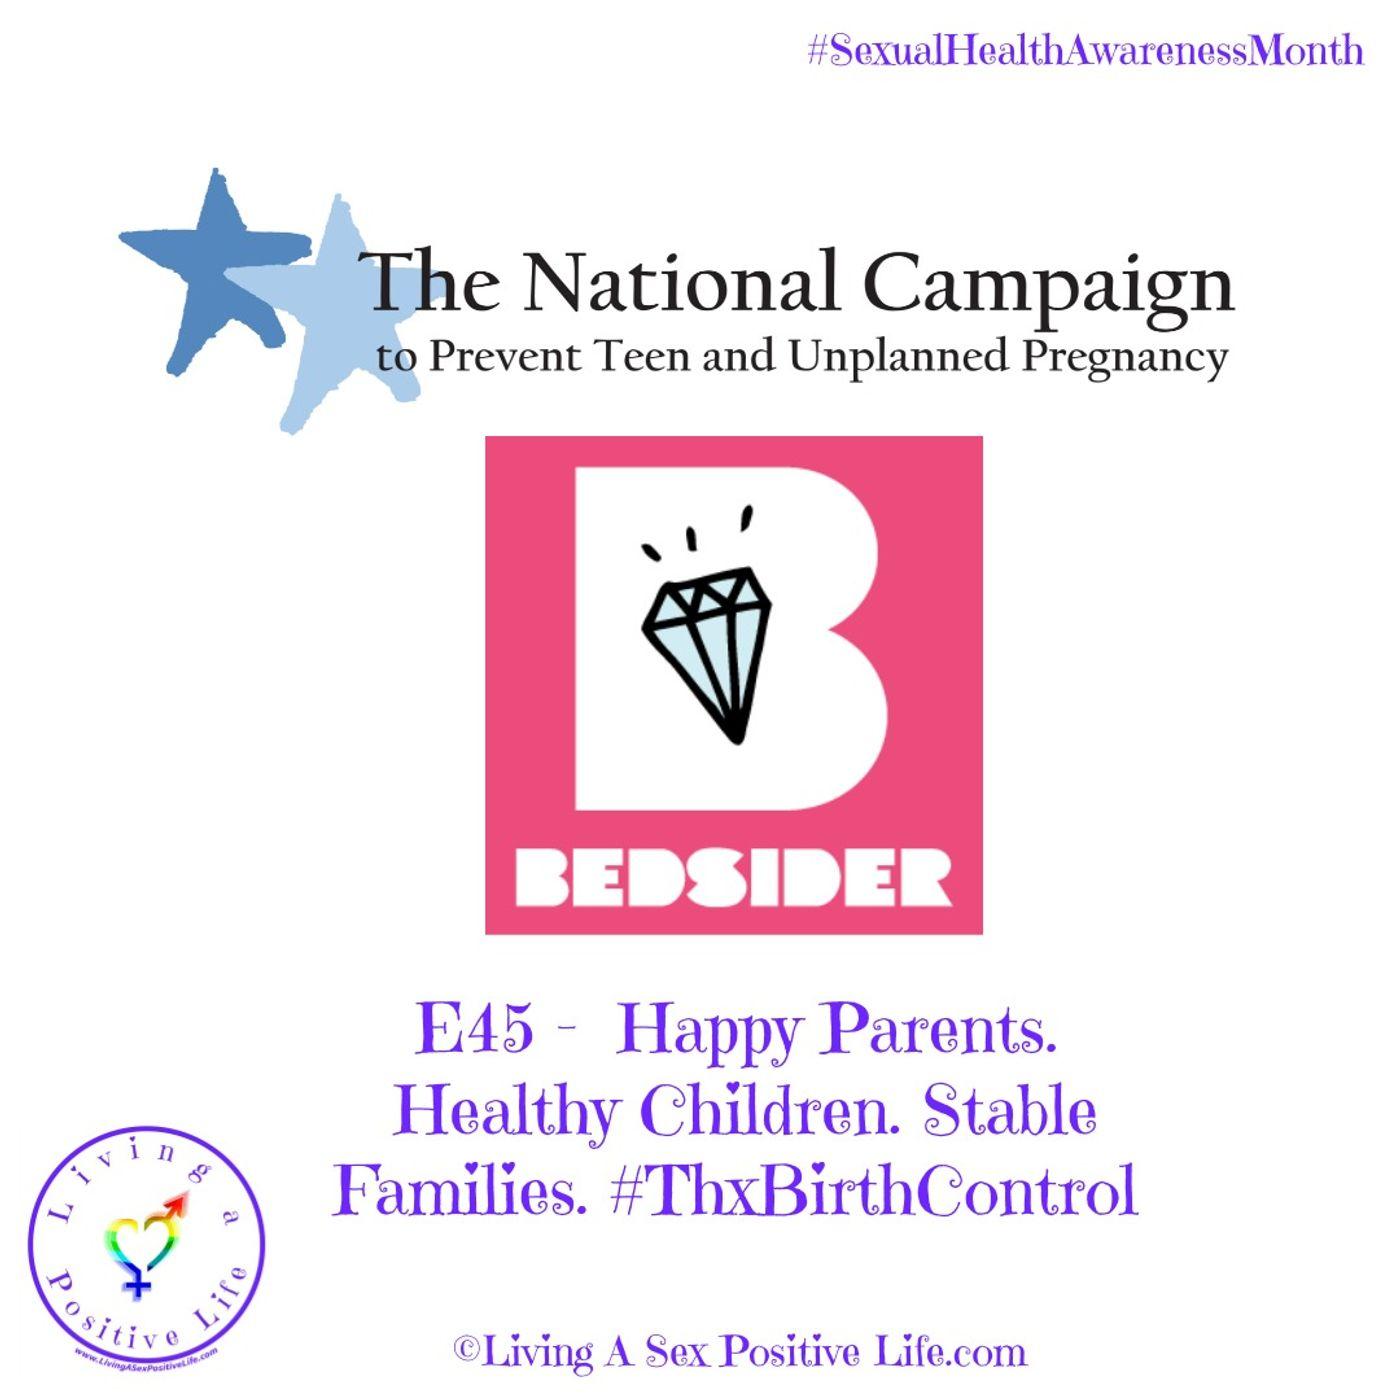 Sex Positive Me - E45 - Happy Parents. Healthy Children. Stable Families. #ThxBirthControl